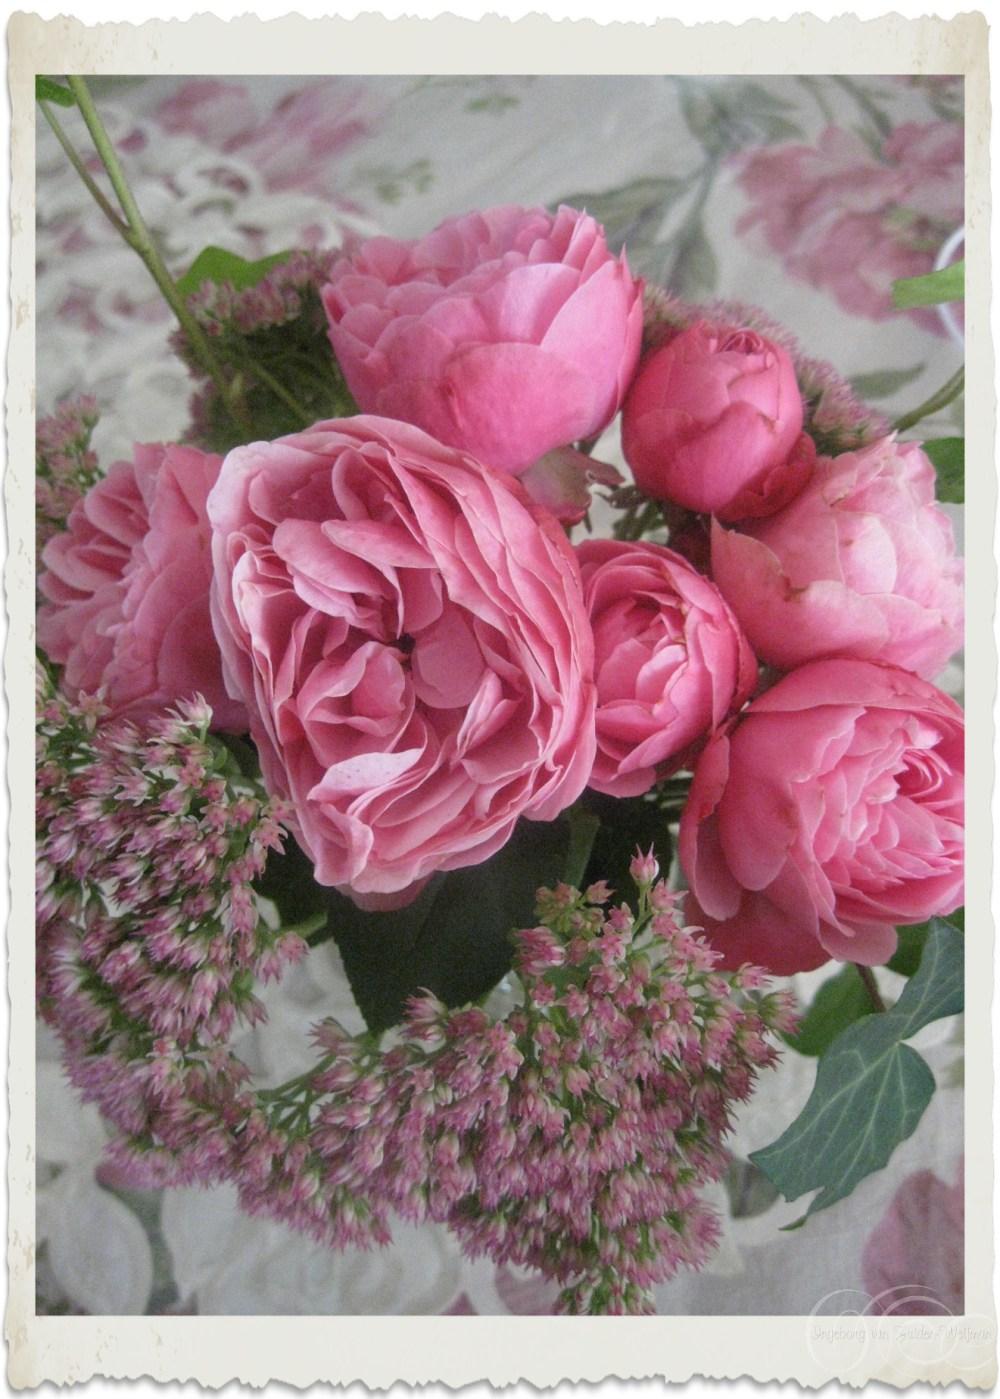 A bouquet from the garden